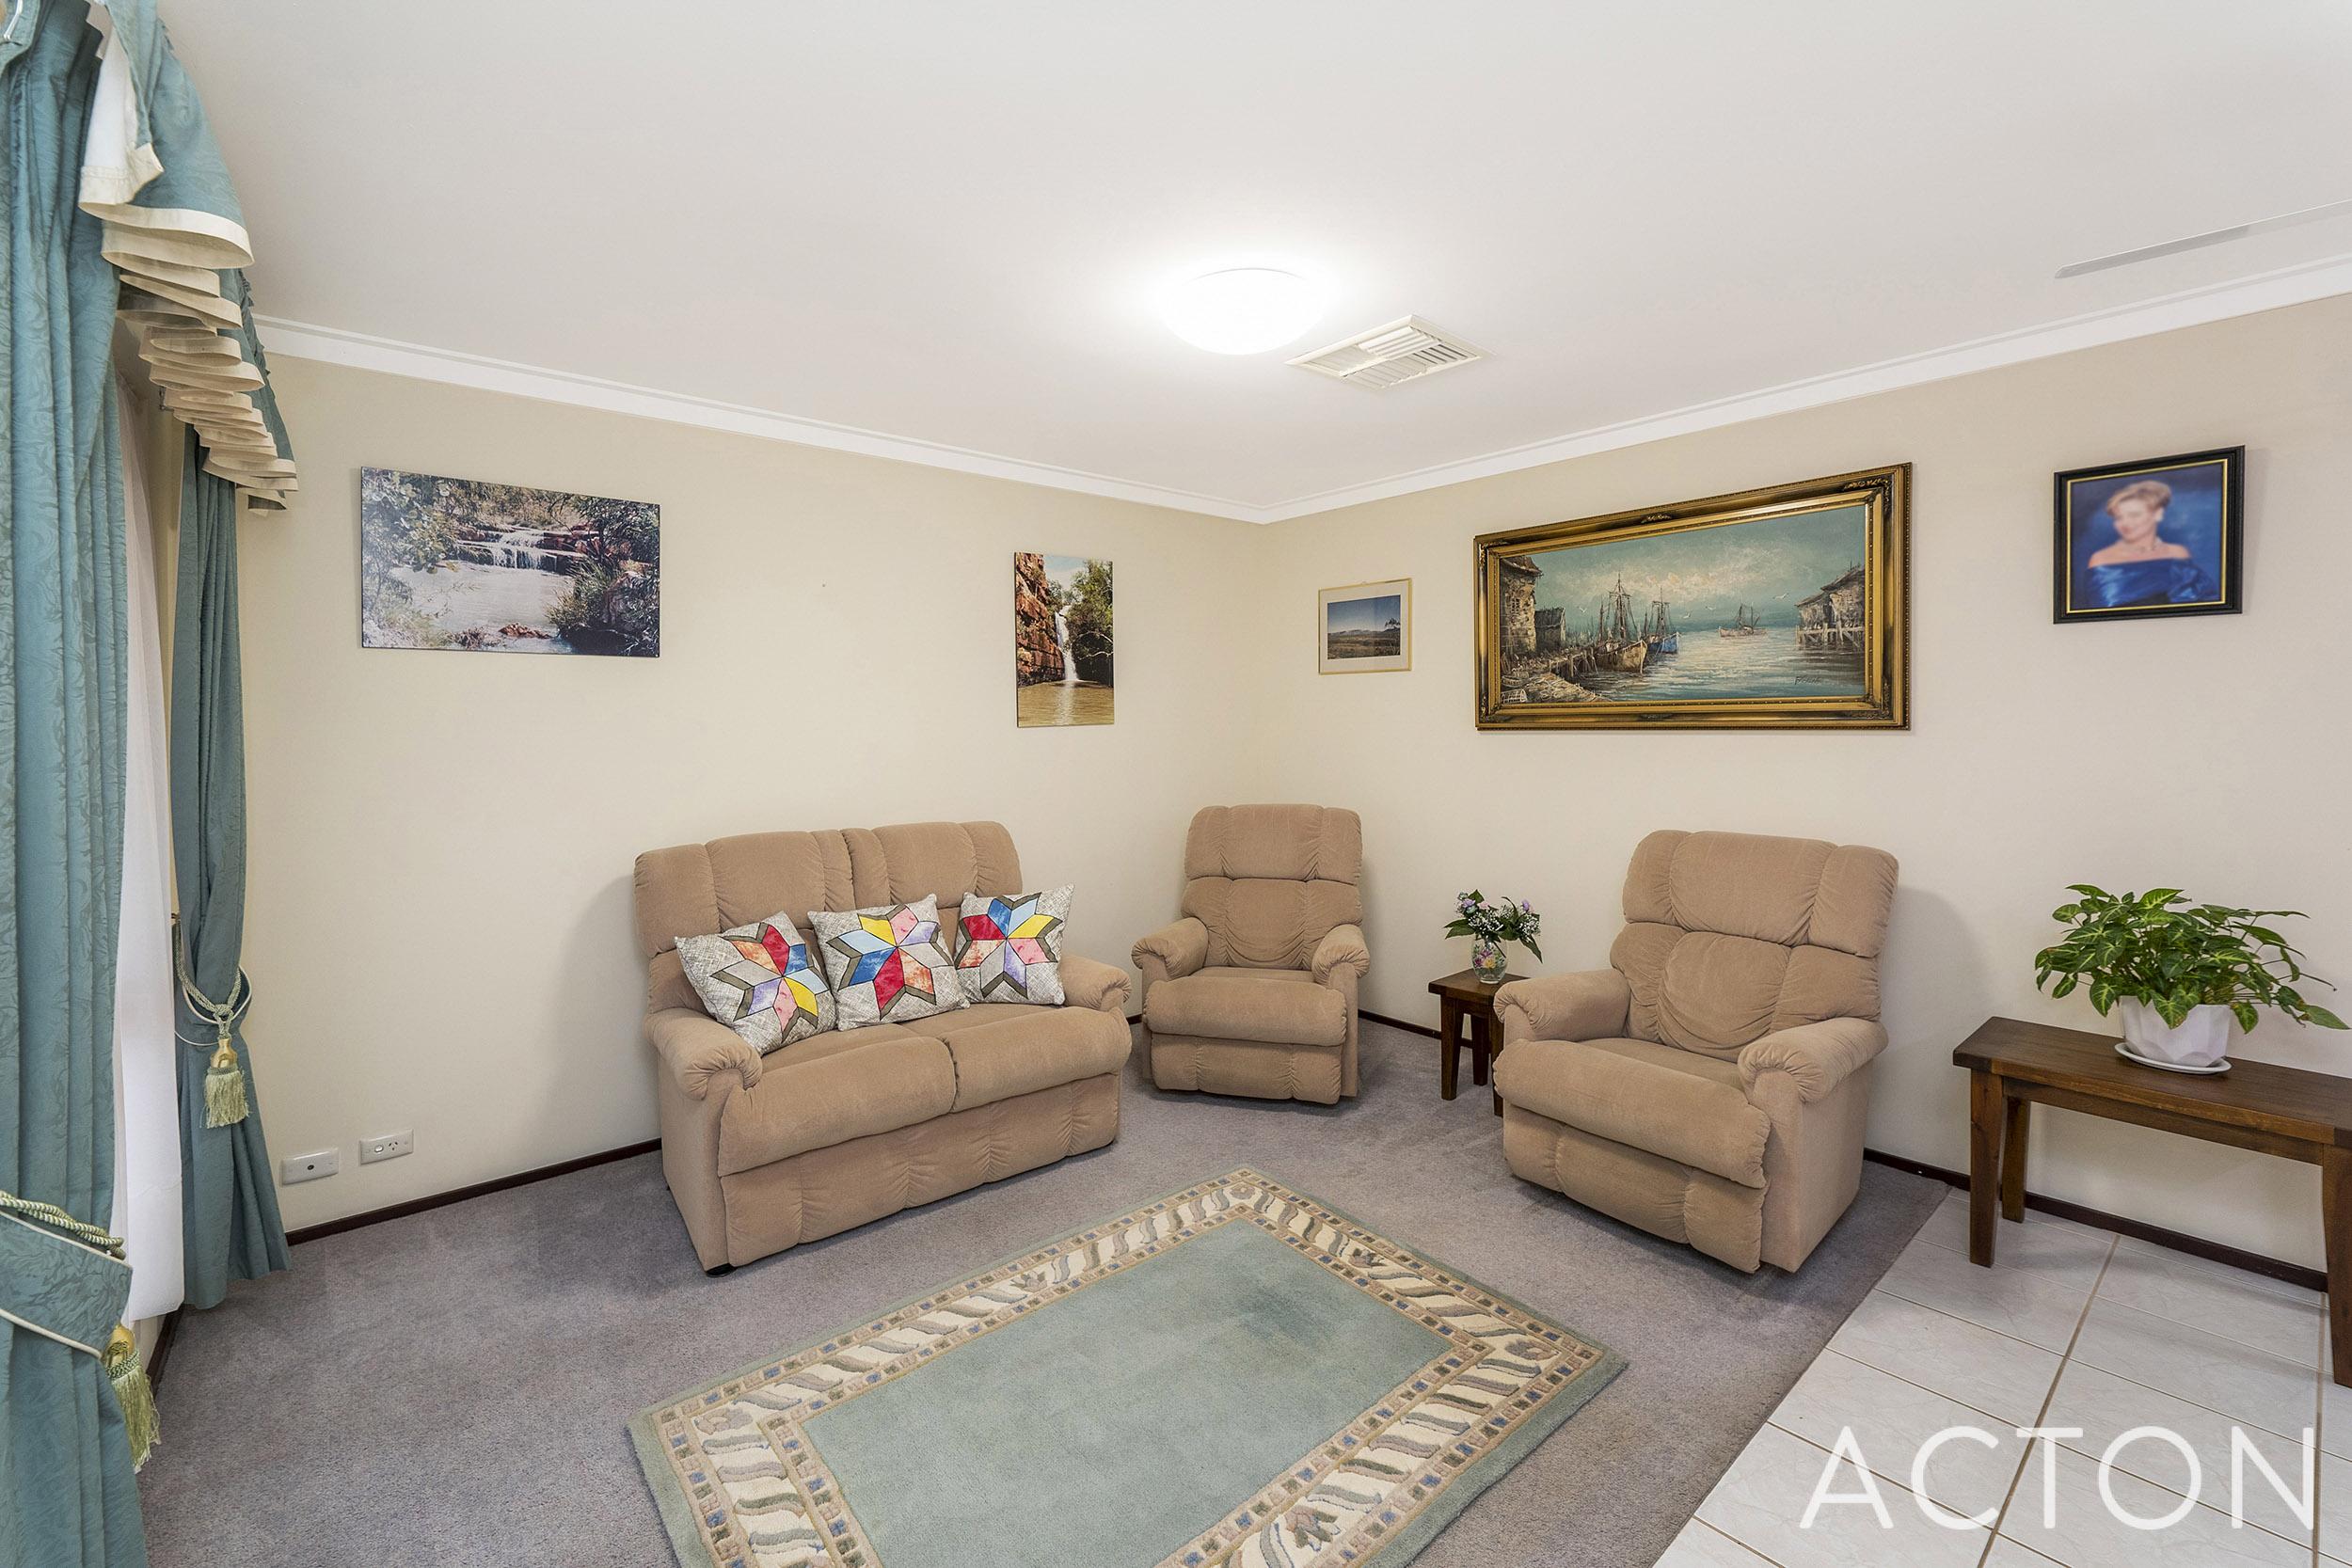 3/9 Creery Street Dudley Park - House For Sale - 23078542 - ACTON Mandurah